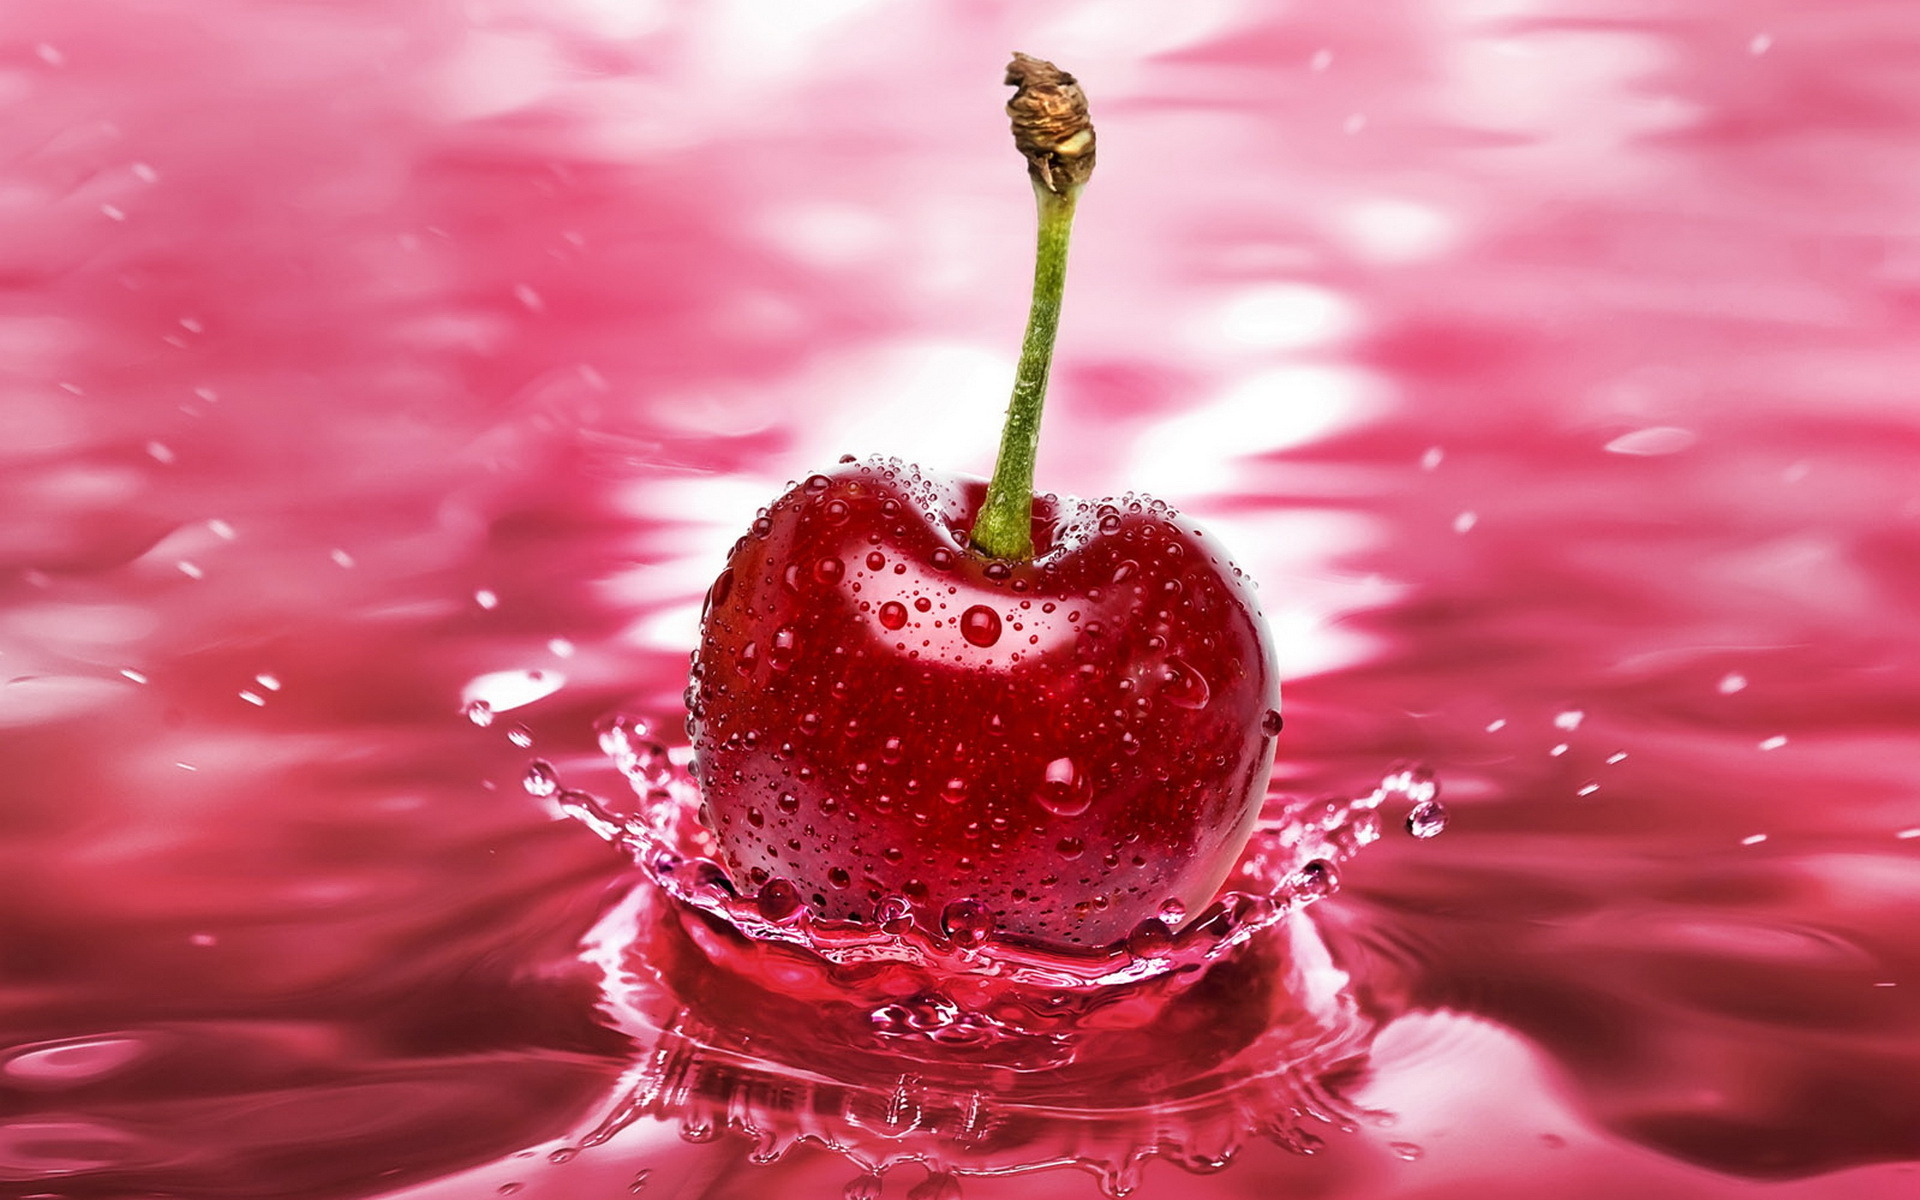 Cherry goodness by Bendarksilver